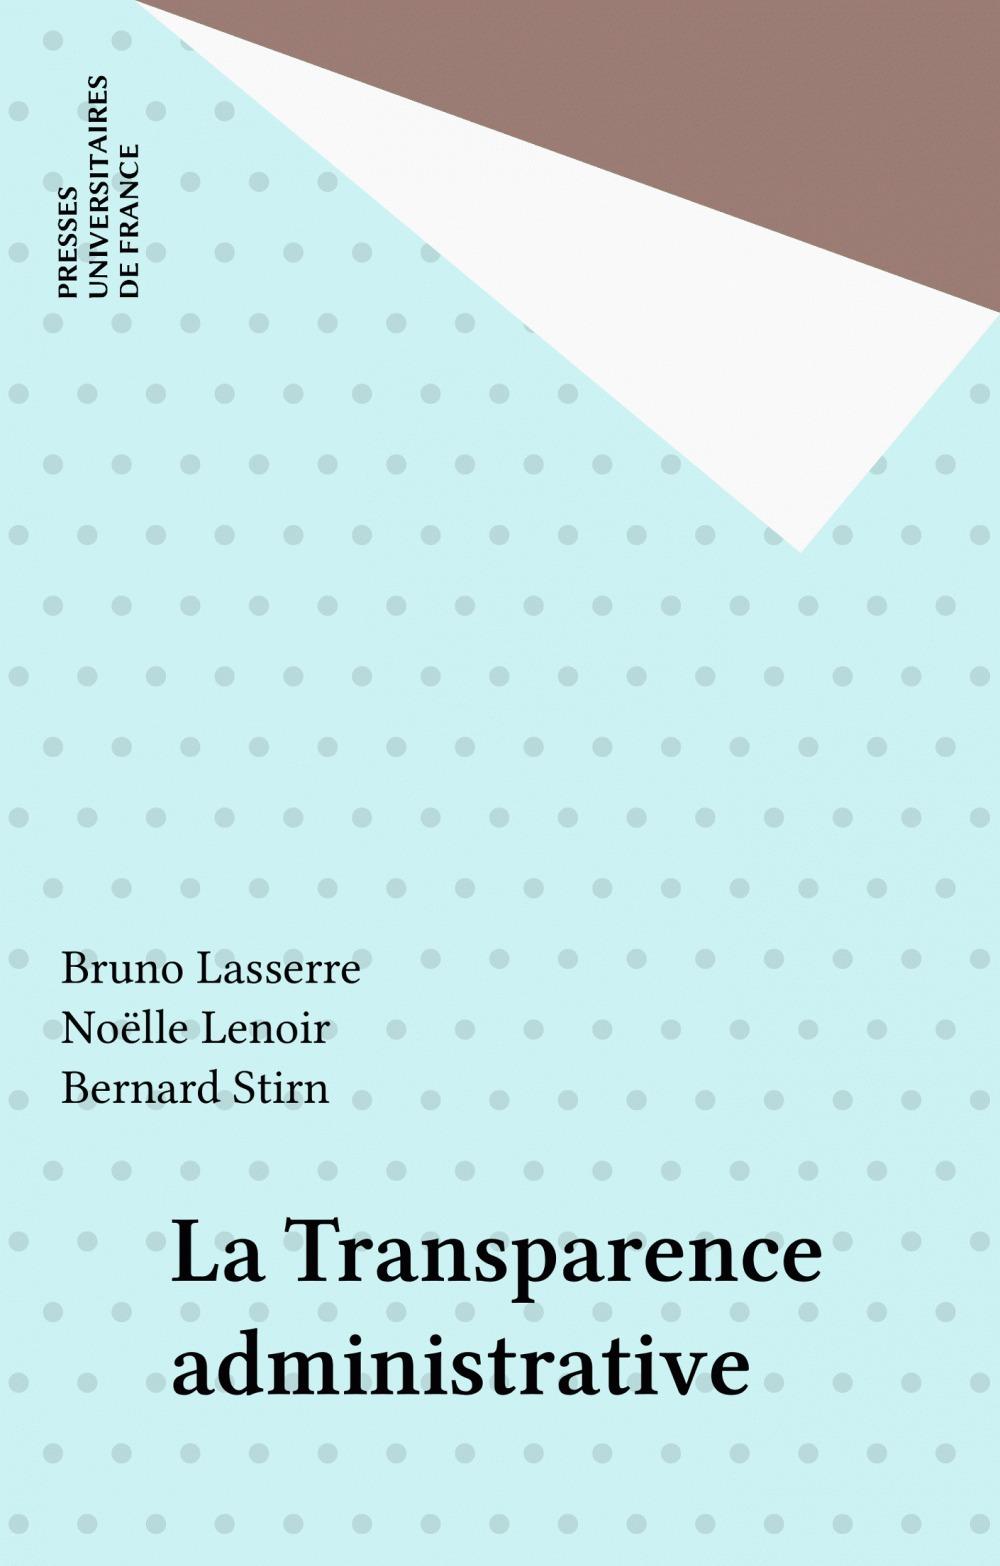 La Transparence administrative